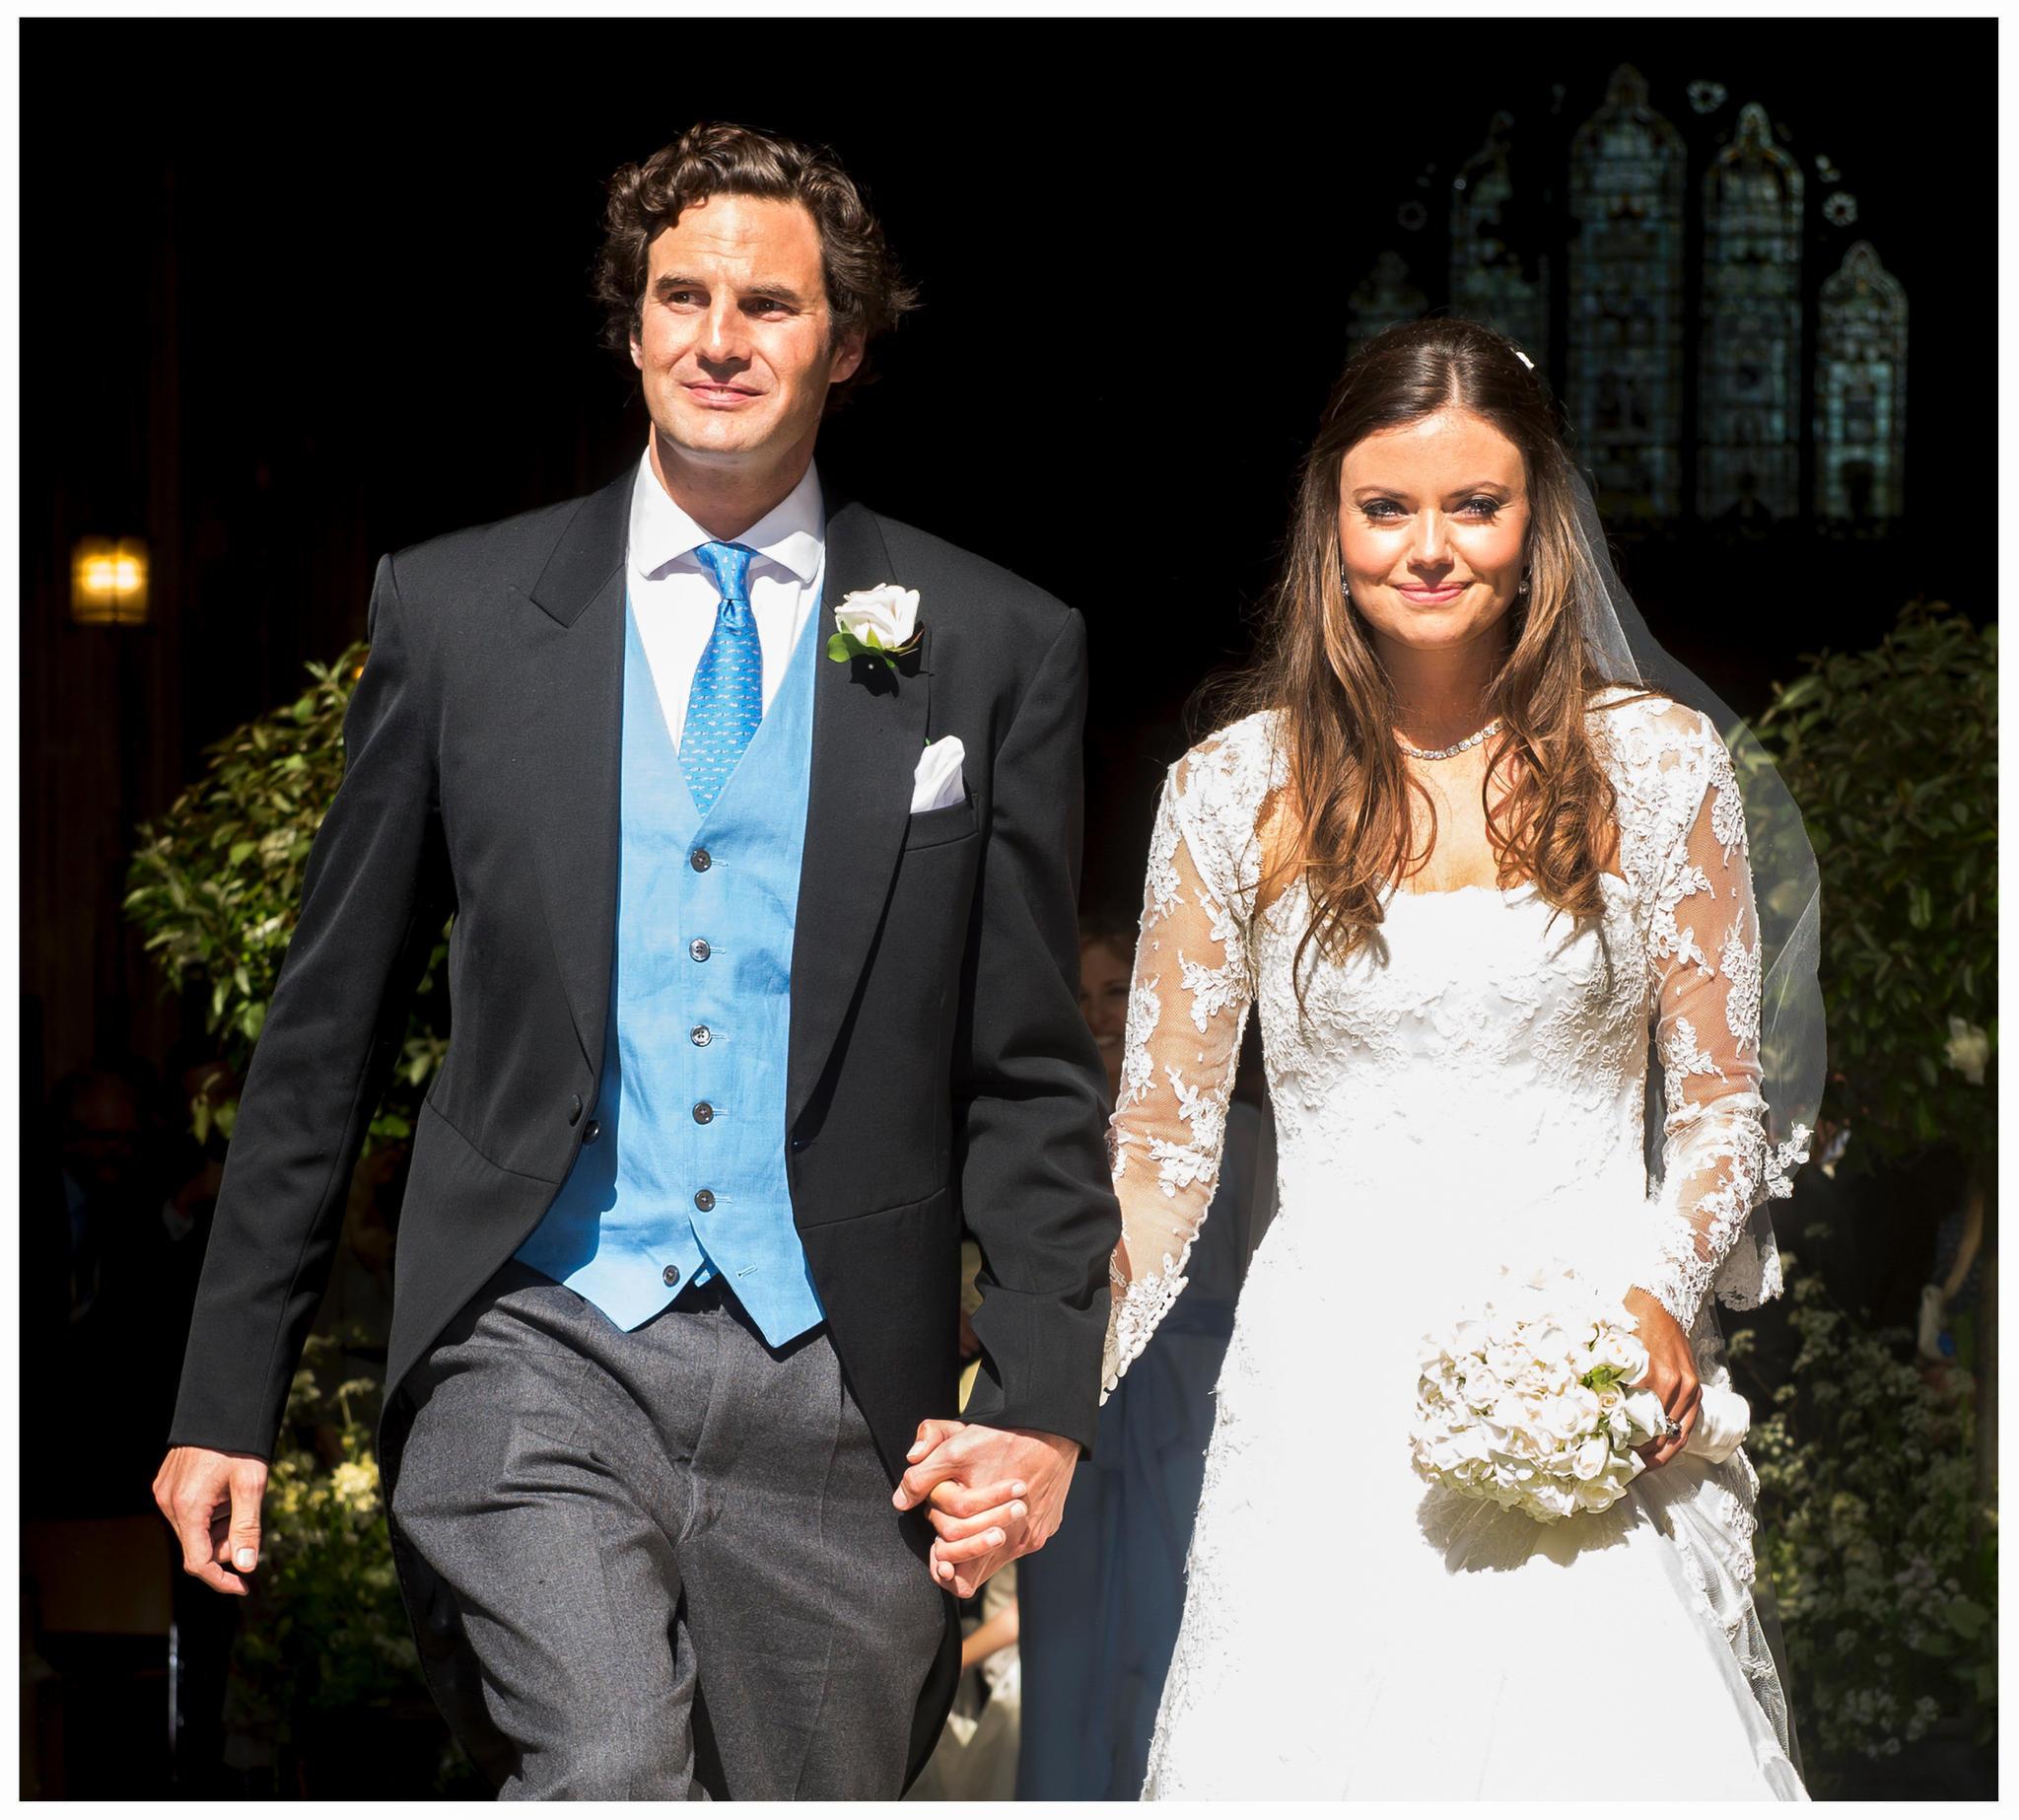 2013 heiratete Lady Natasha Rufus Isaacs Rupert Finch.